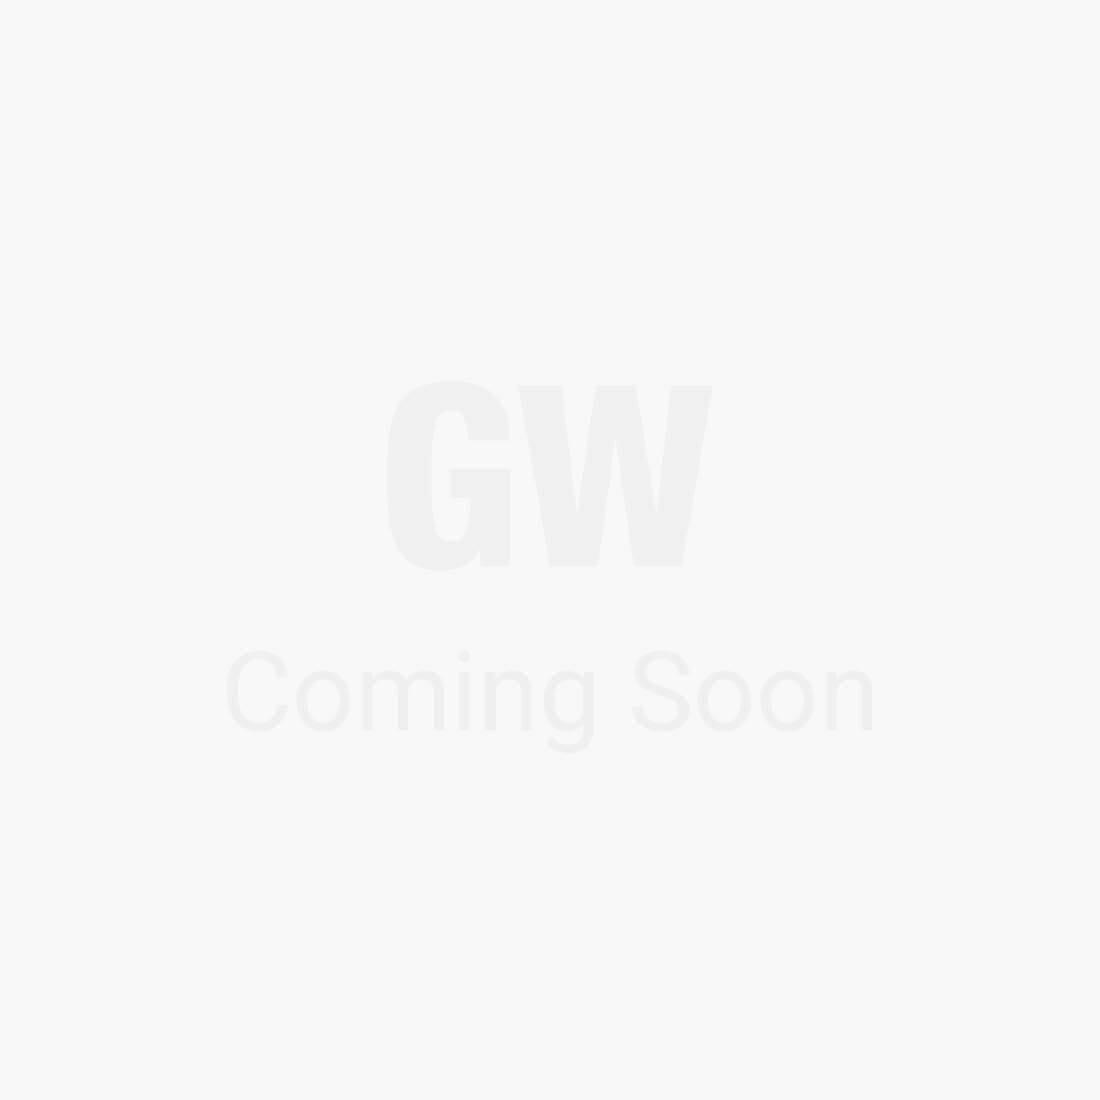 Vittoria Folk Occasional Chair